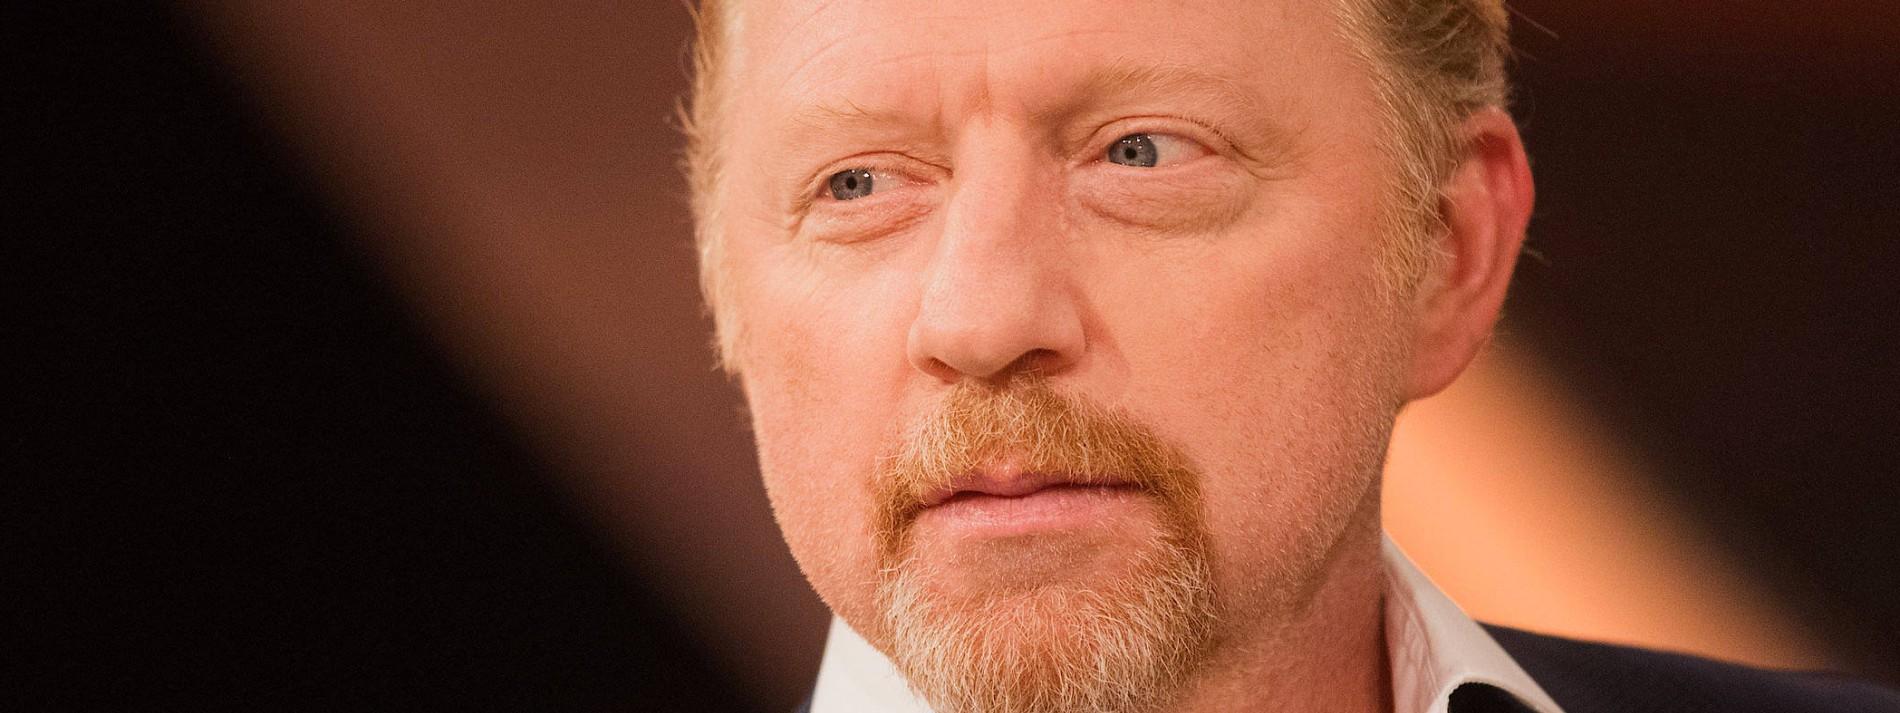 Becker droht Ärger mit britischer Regierung